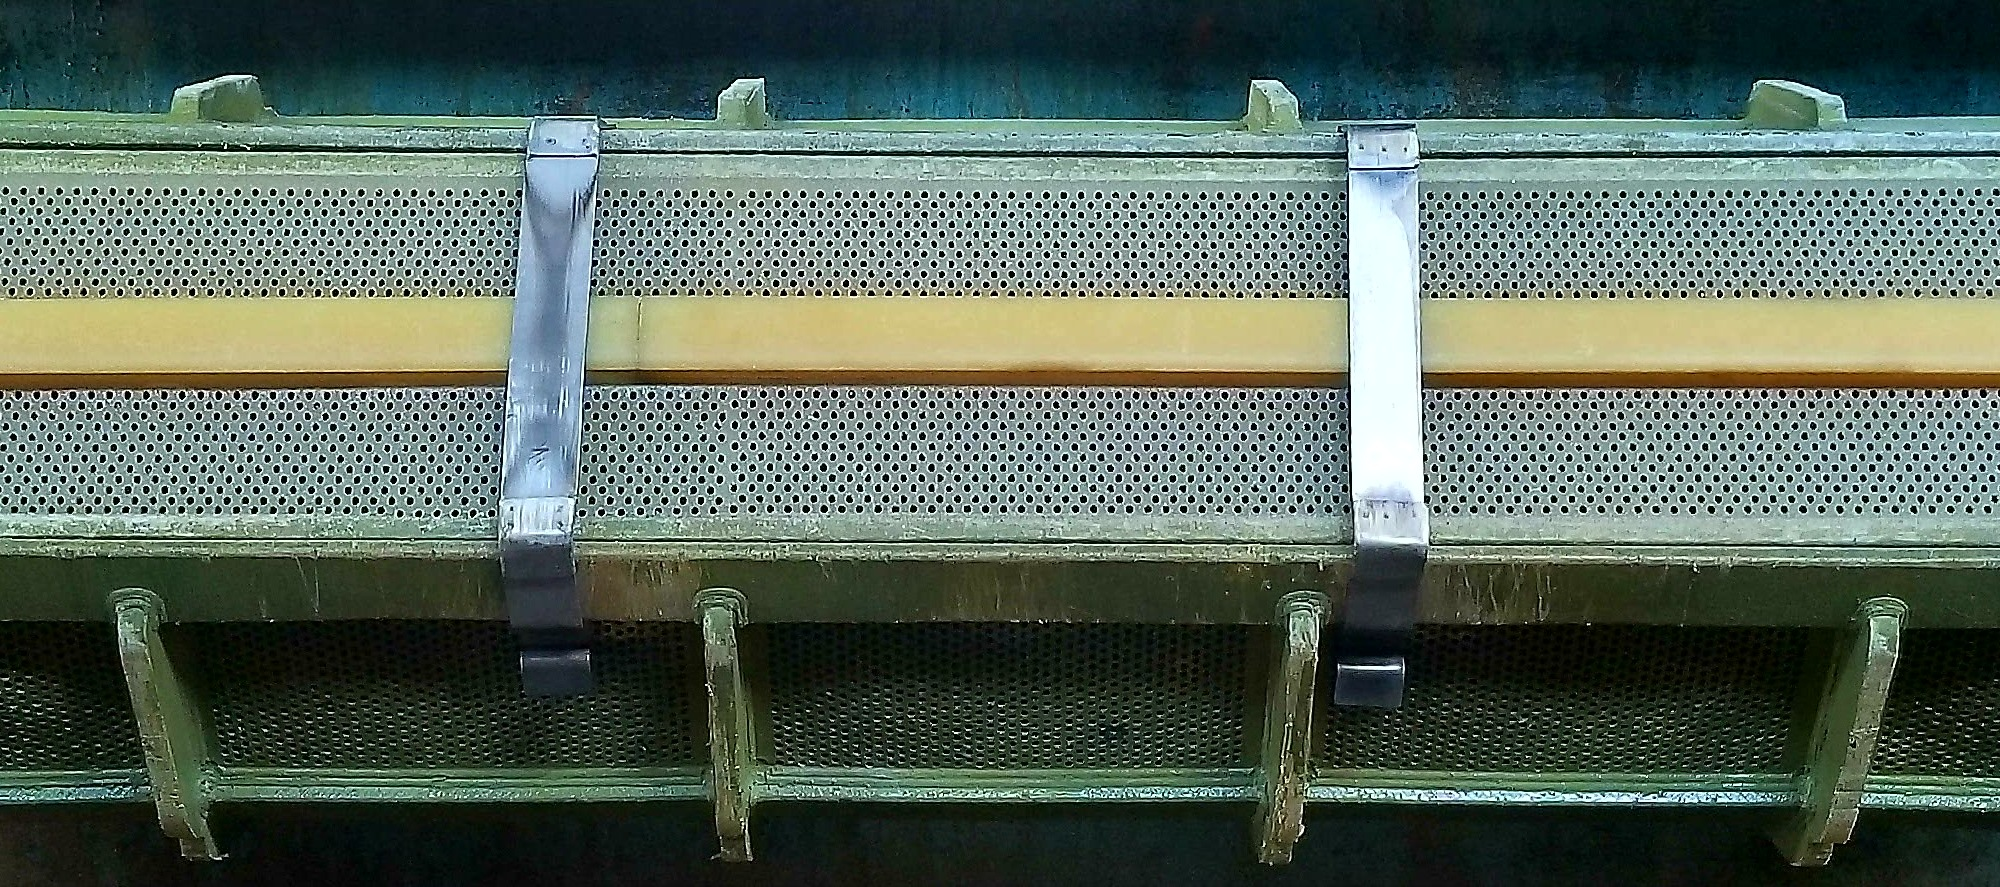 The Barrel Electroplating Process – H&E Plating Ltd, Electroplaters